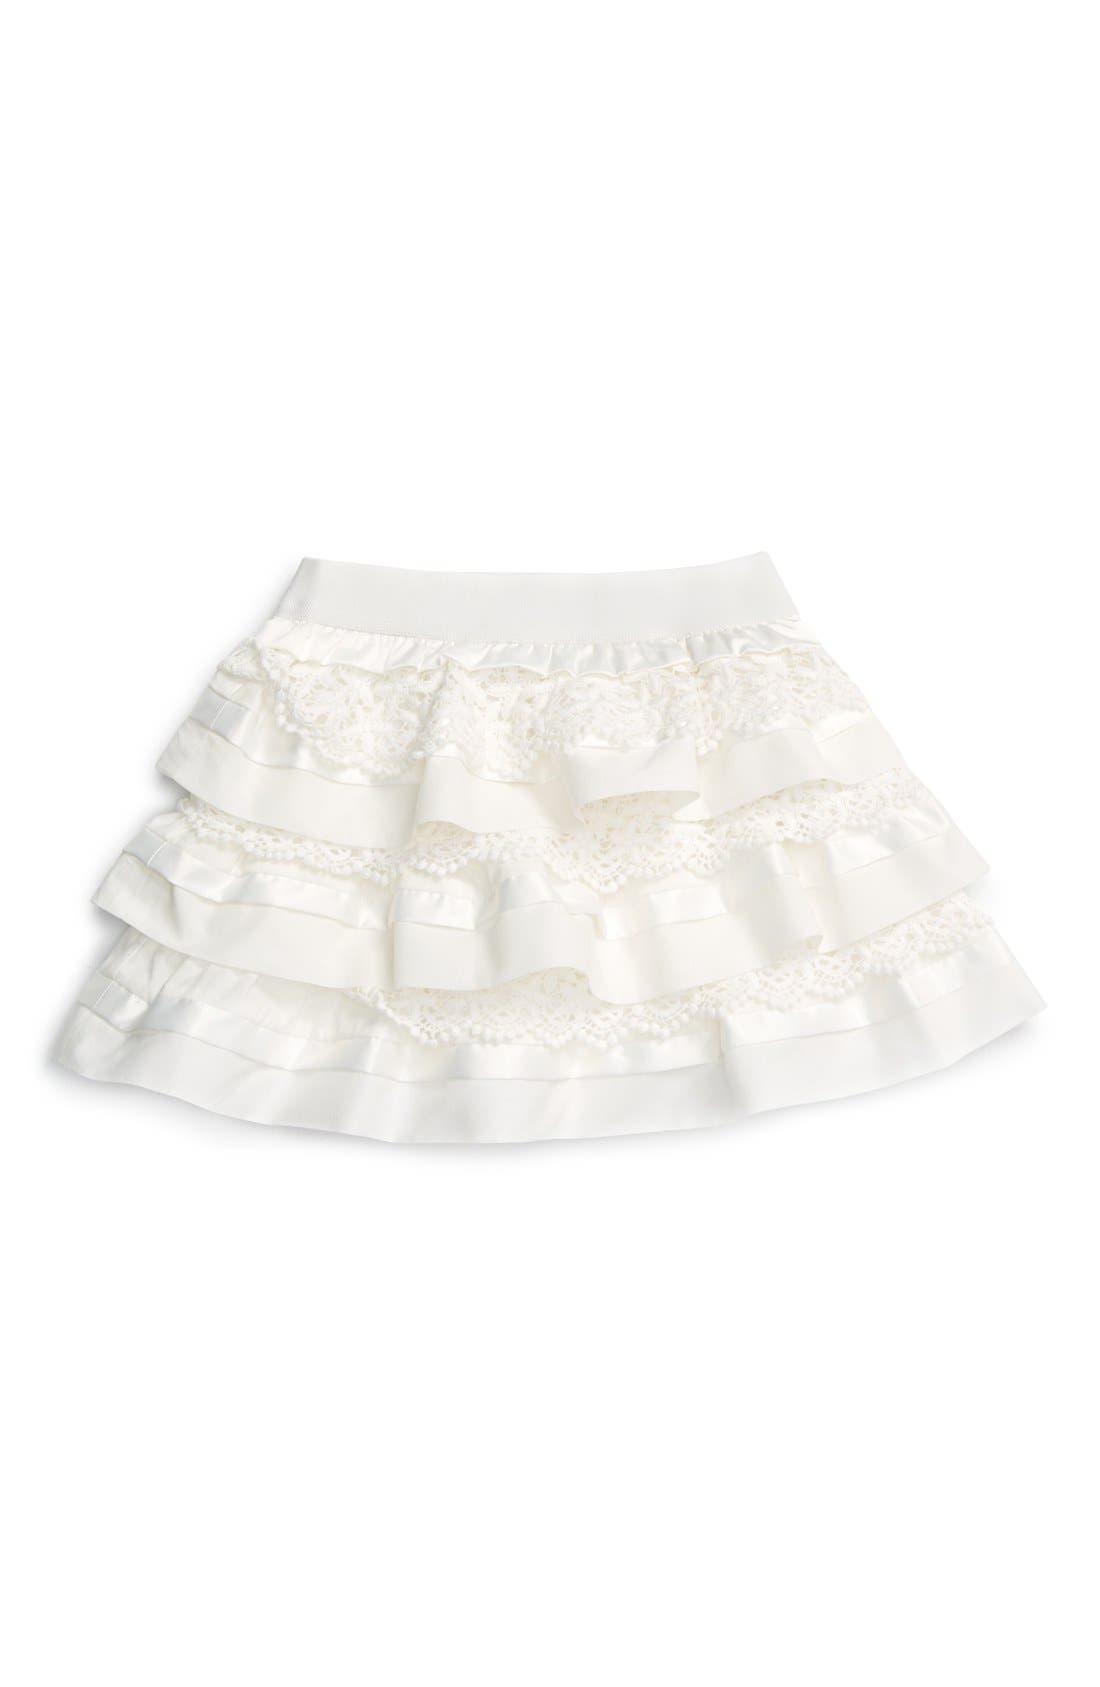 'Macarena Ra Ra' Tiered Ruffle Skirt, Main, color, 900